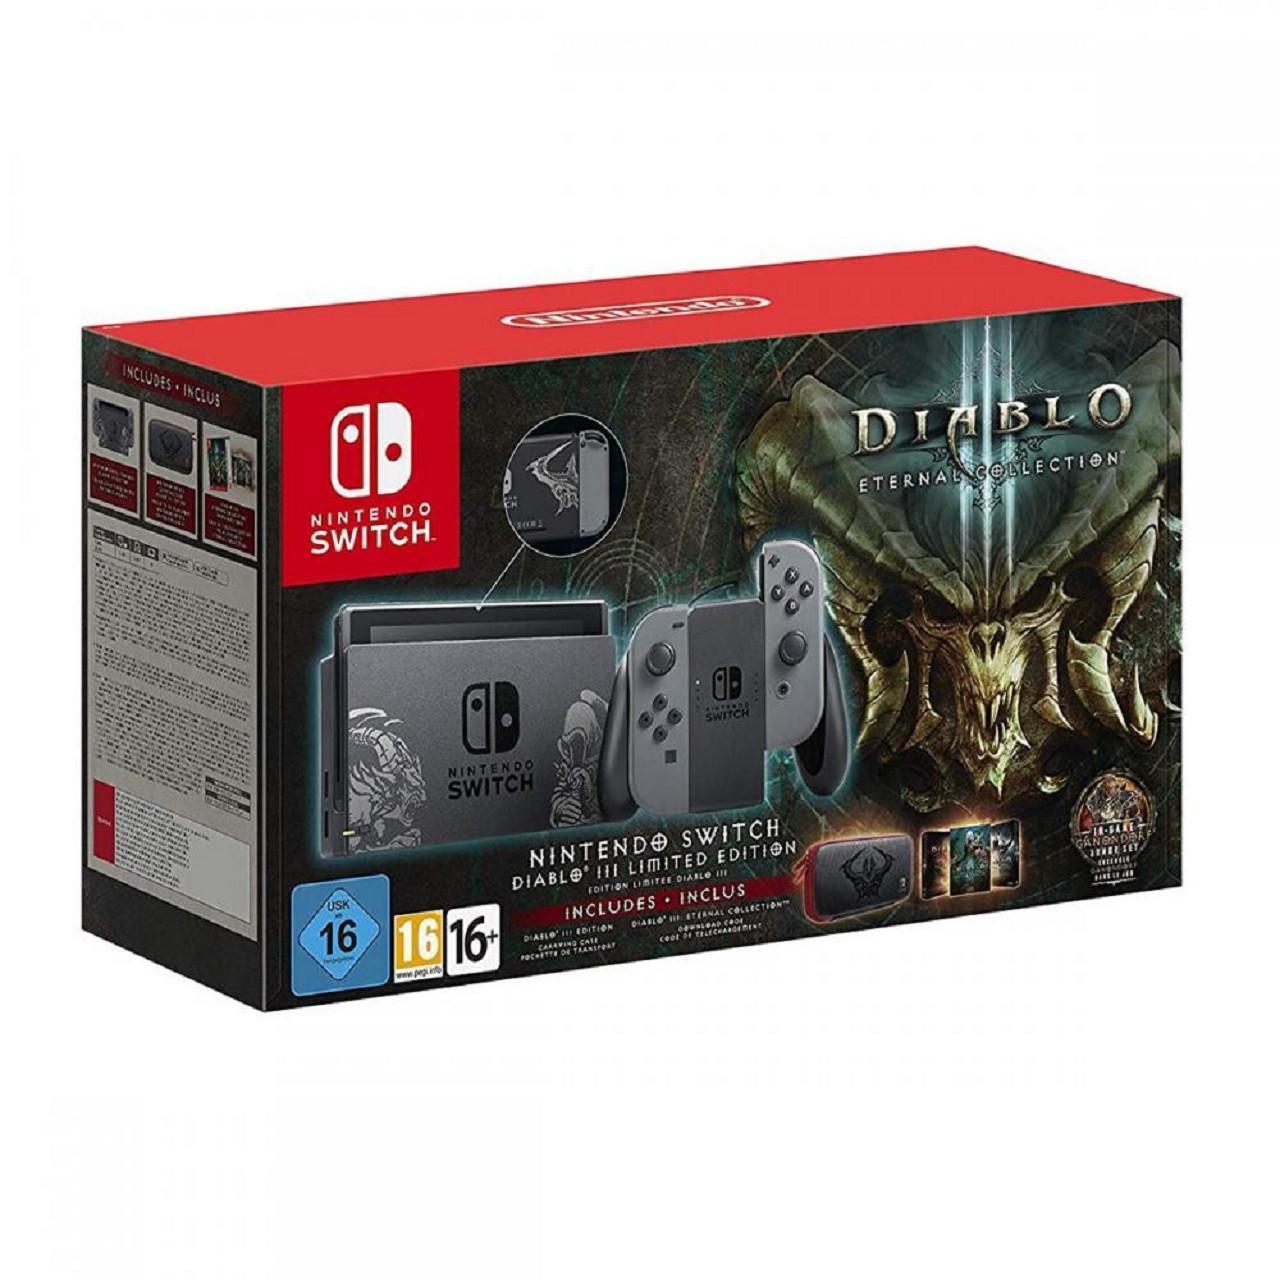 Ігрова консоль (приставка) Nintendo Switch Grey Diablo 3 Limited Edition